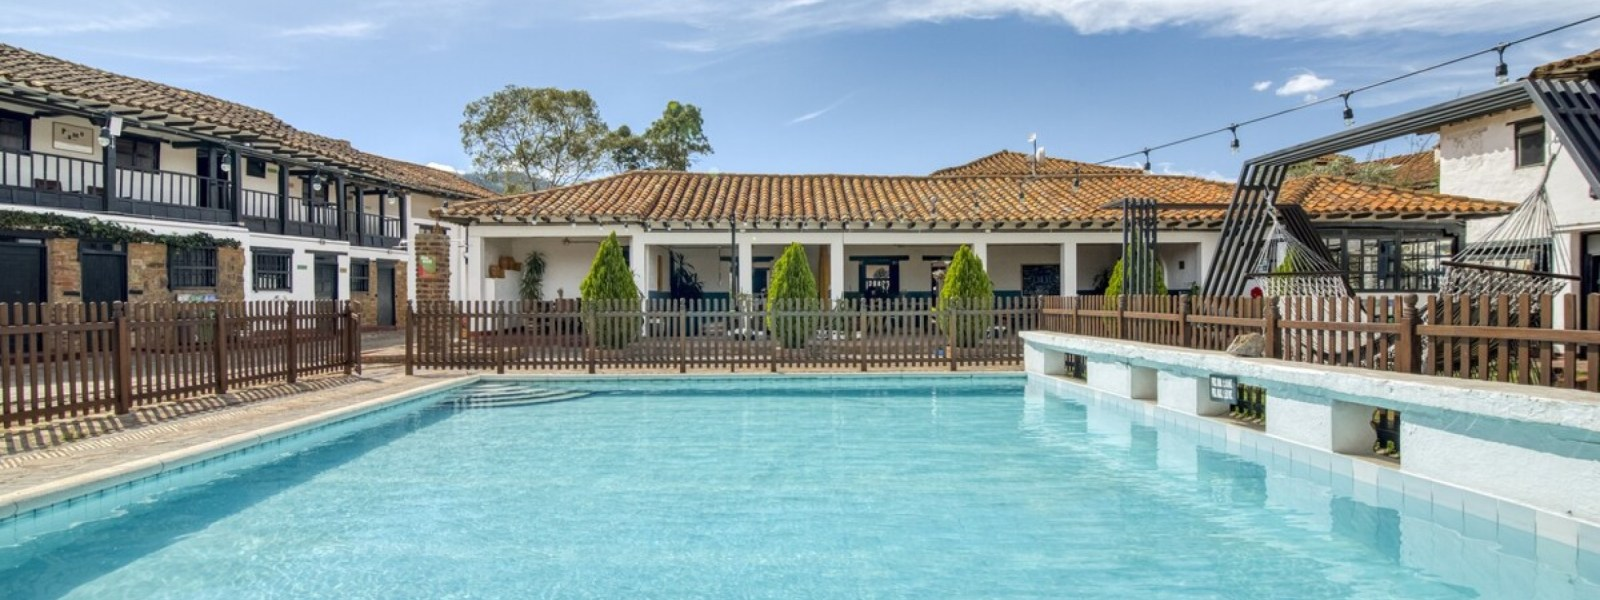 Airbnb Villa de Leyva: 6 mooiste slaapplekken via Airbnb